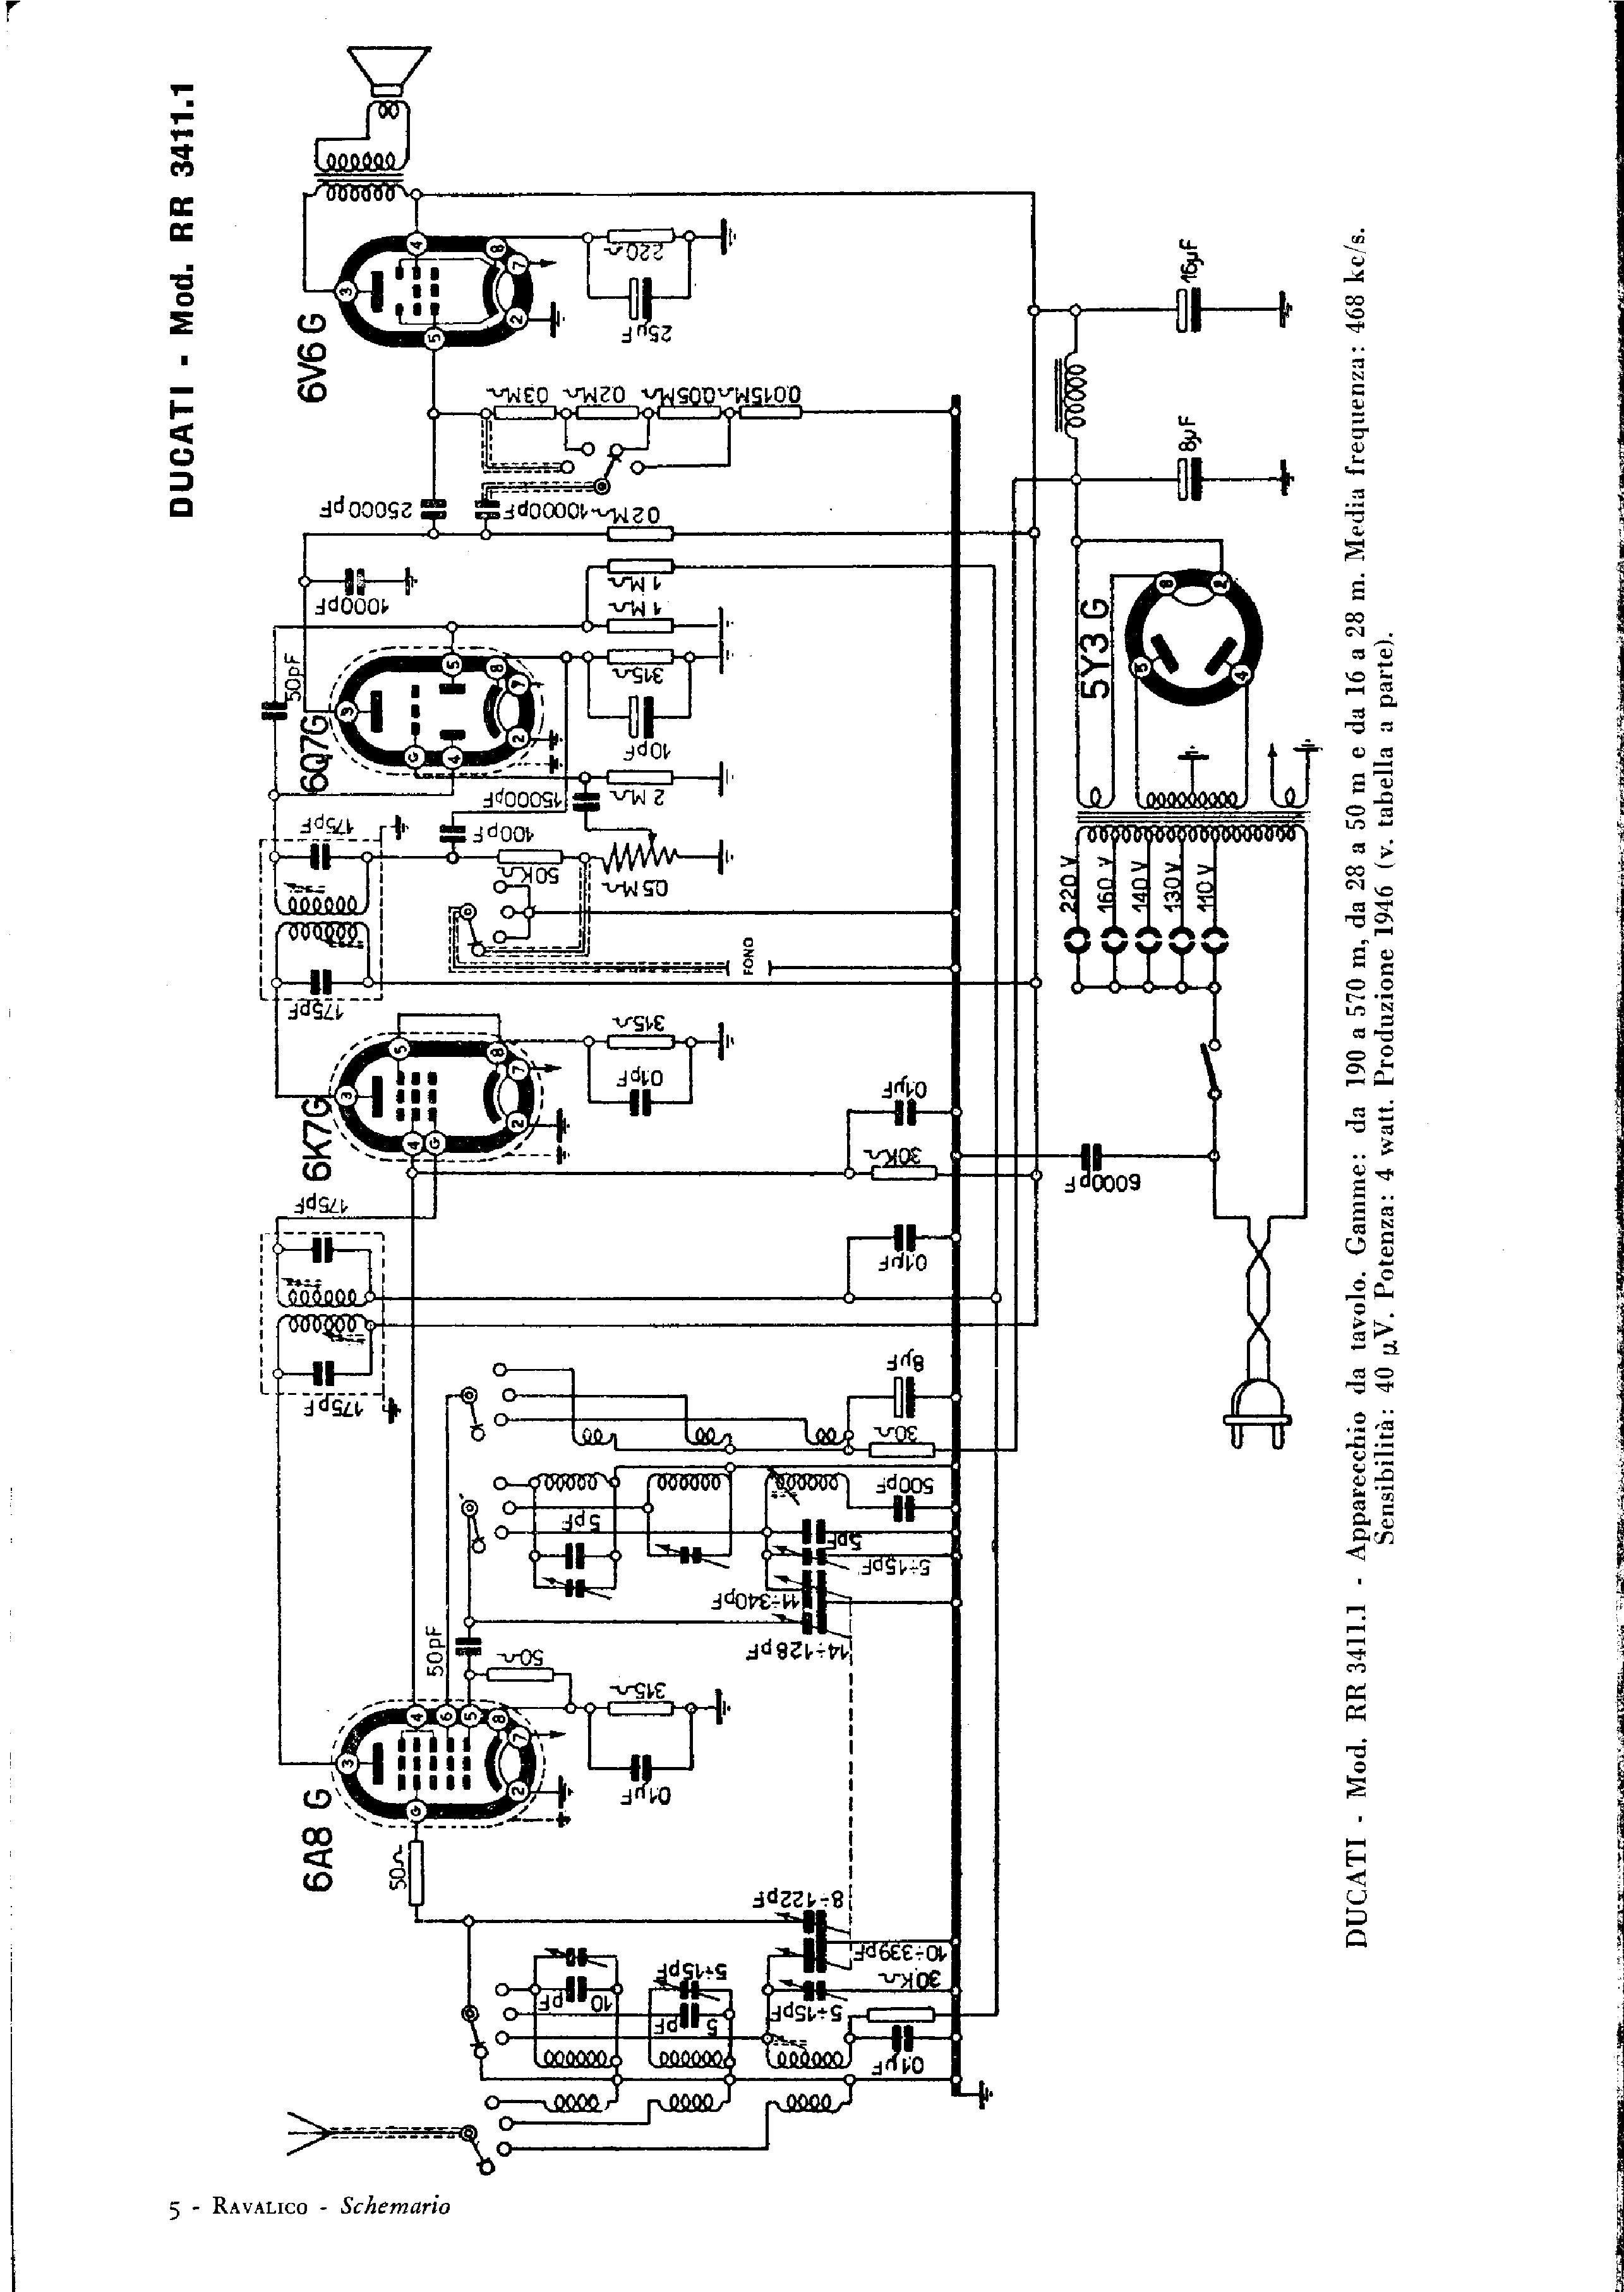 ducati rr4311 sch service manual download  schematics